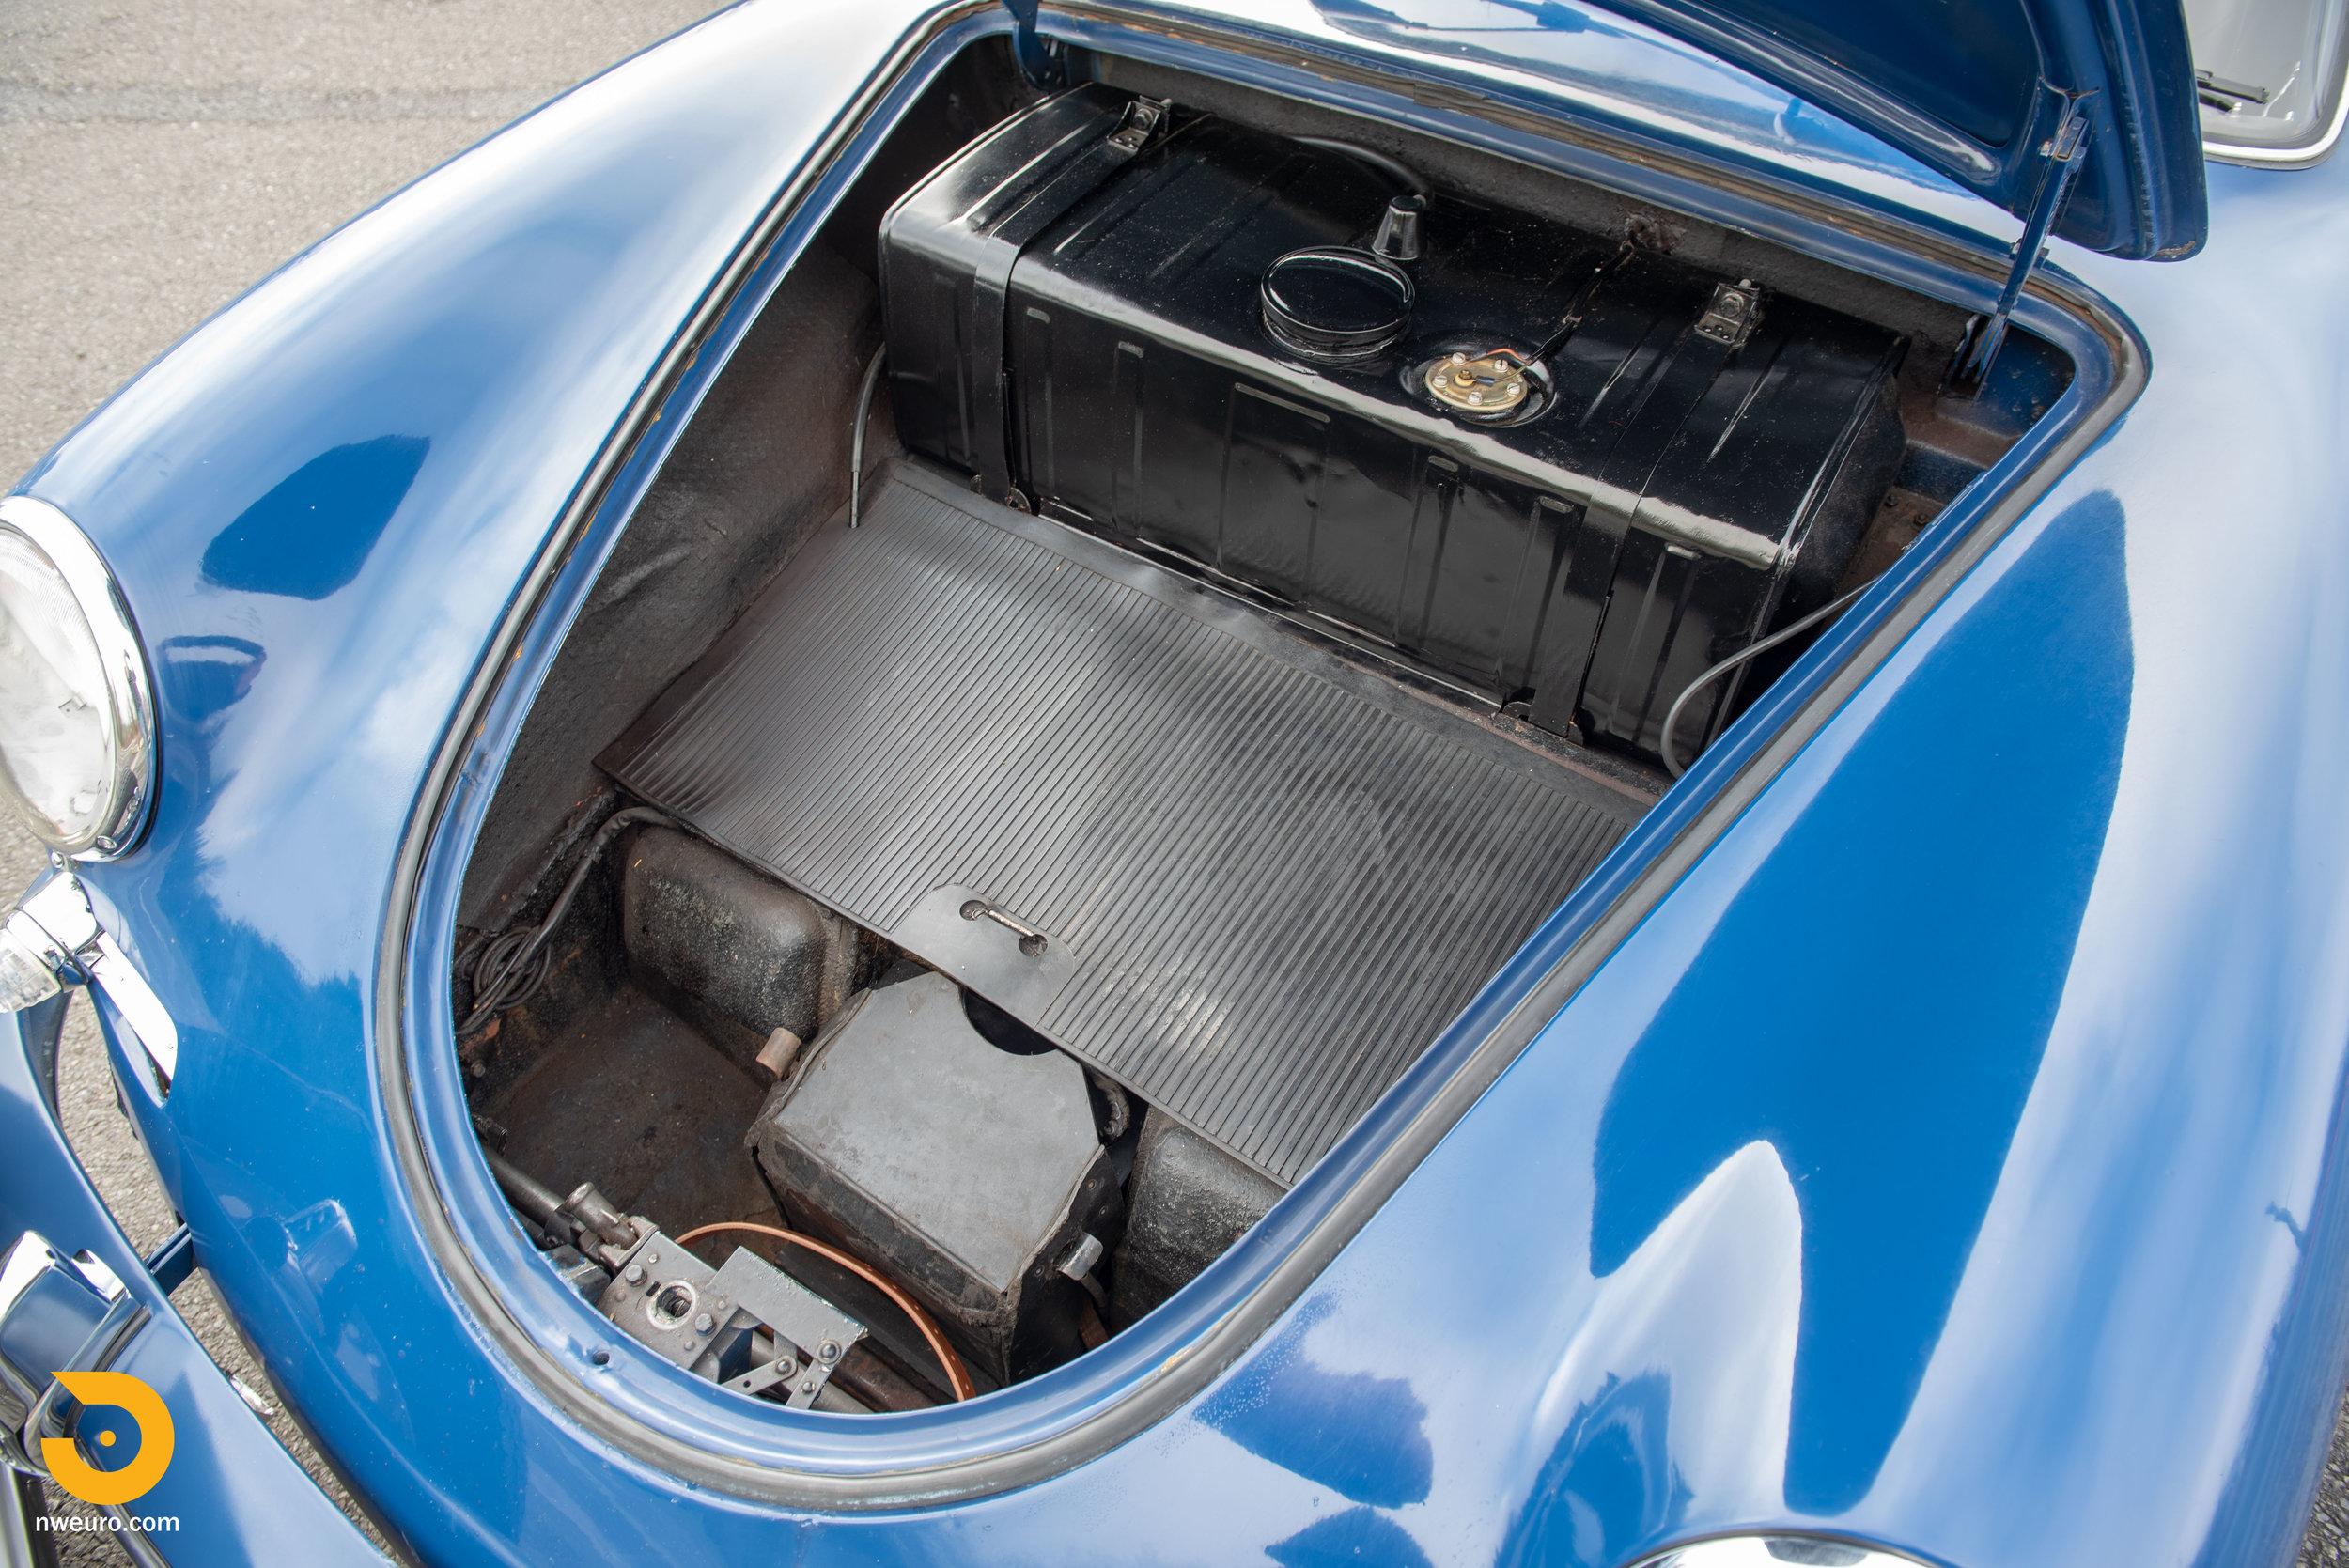 1960 Porsche 356 Hardtop Cab 1600 Super-64.jpg